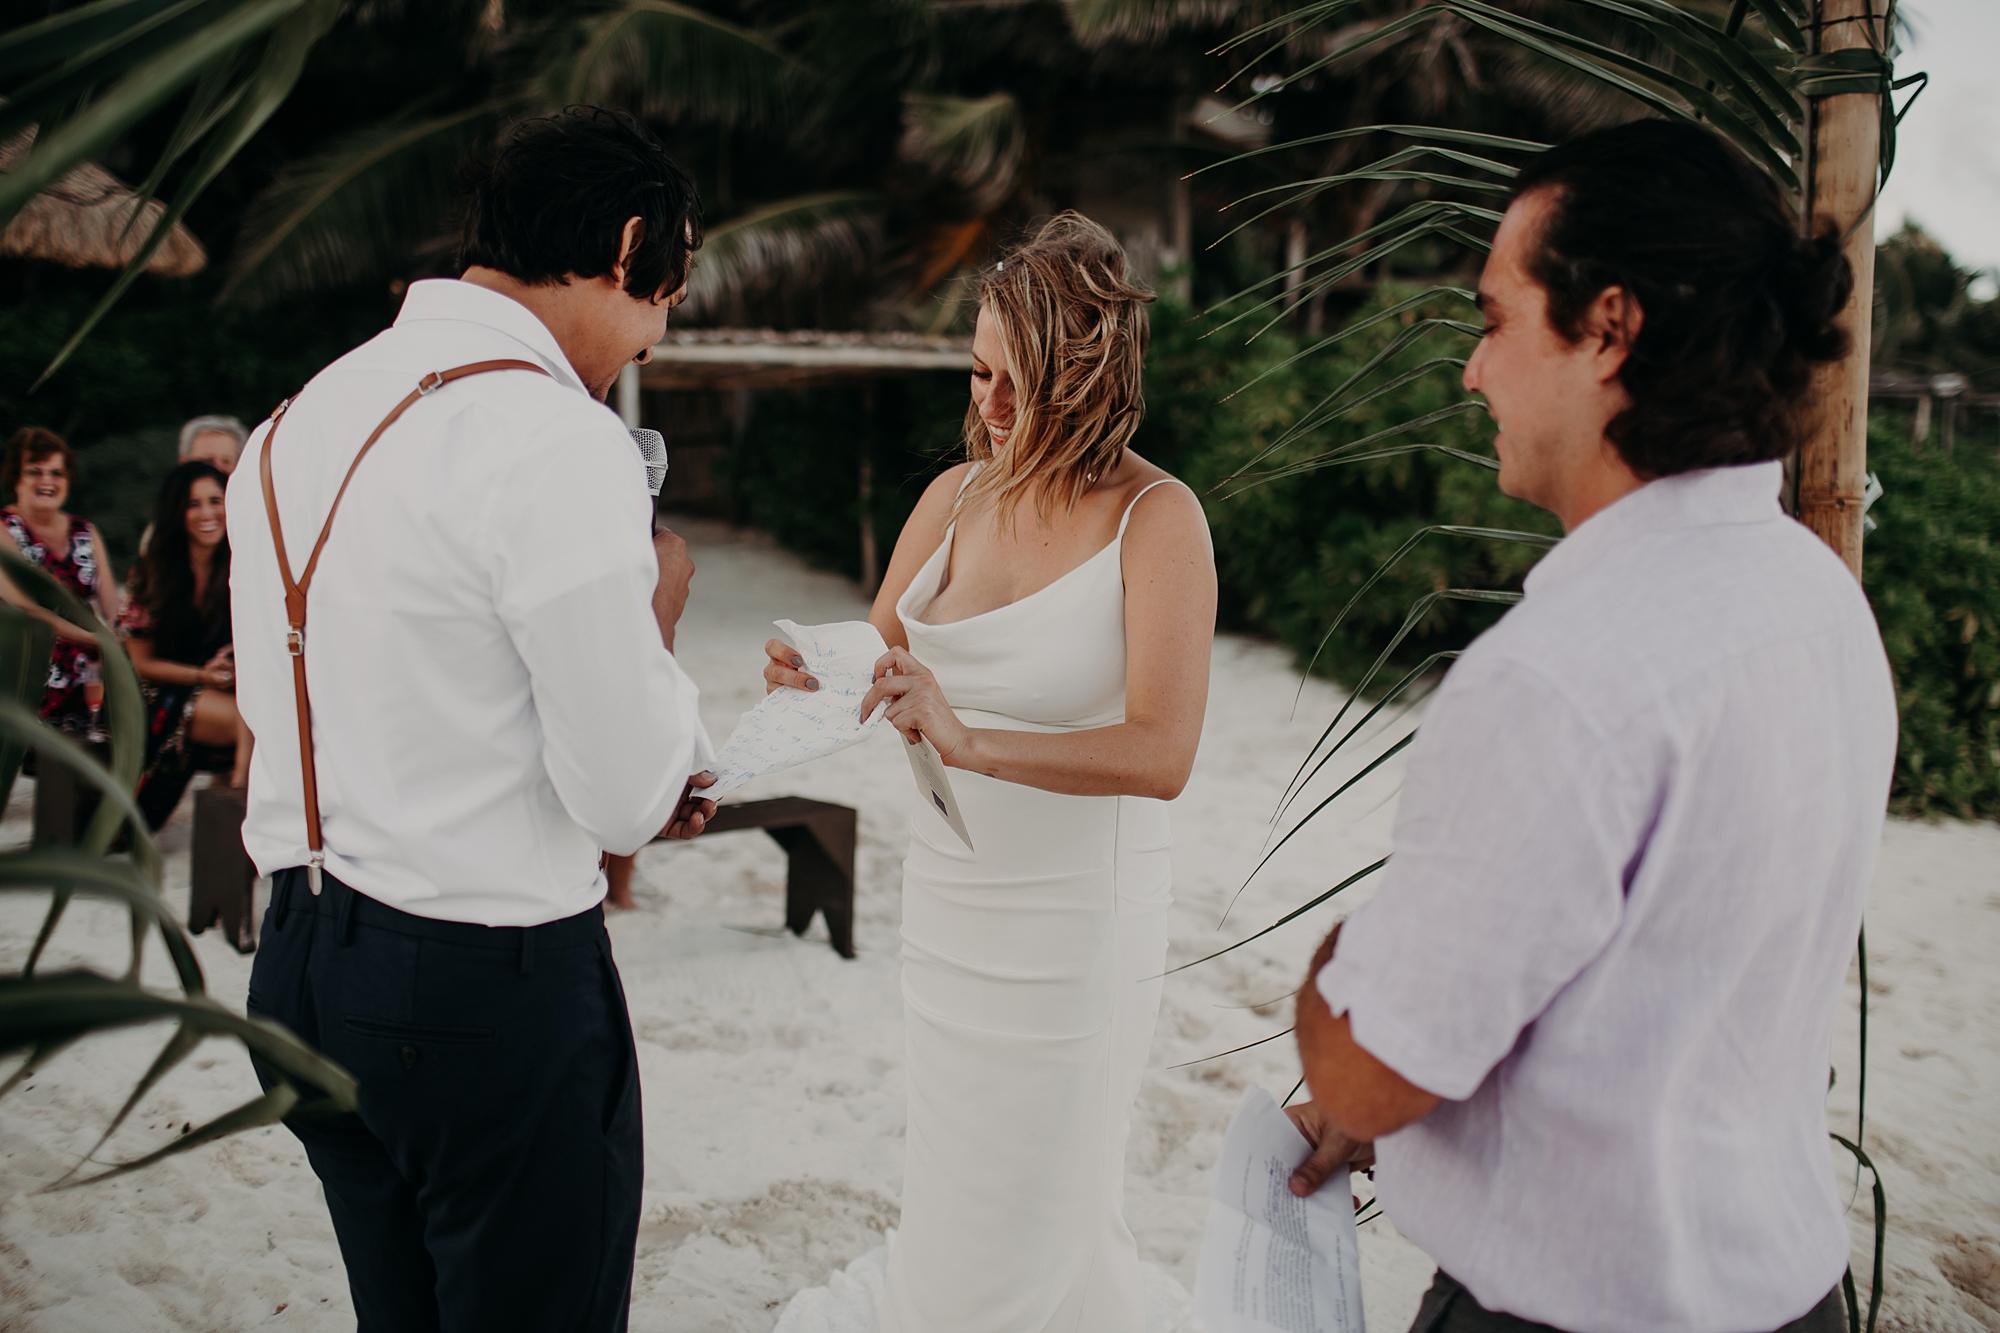 Danielle-San-Antonio-Wedding-Photographer-164_WEB.jpg